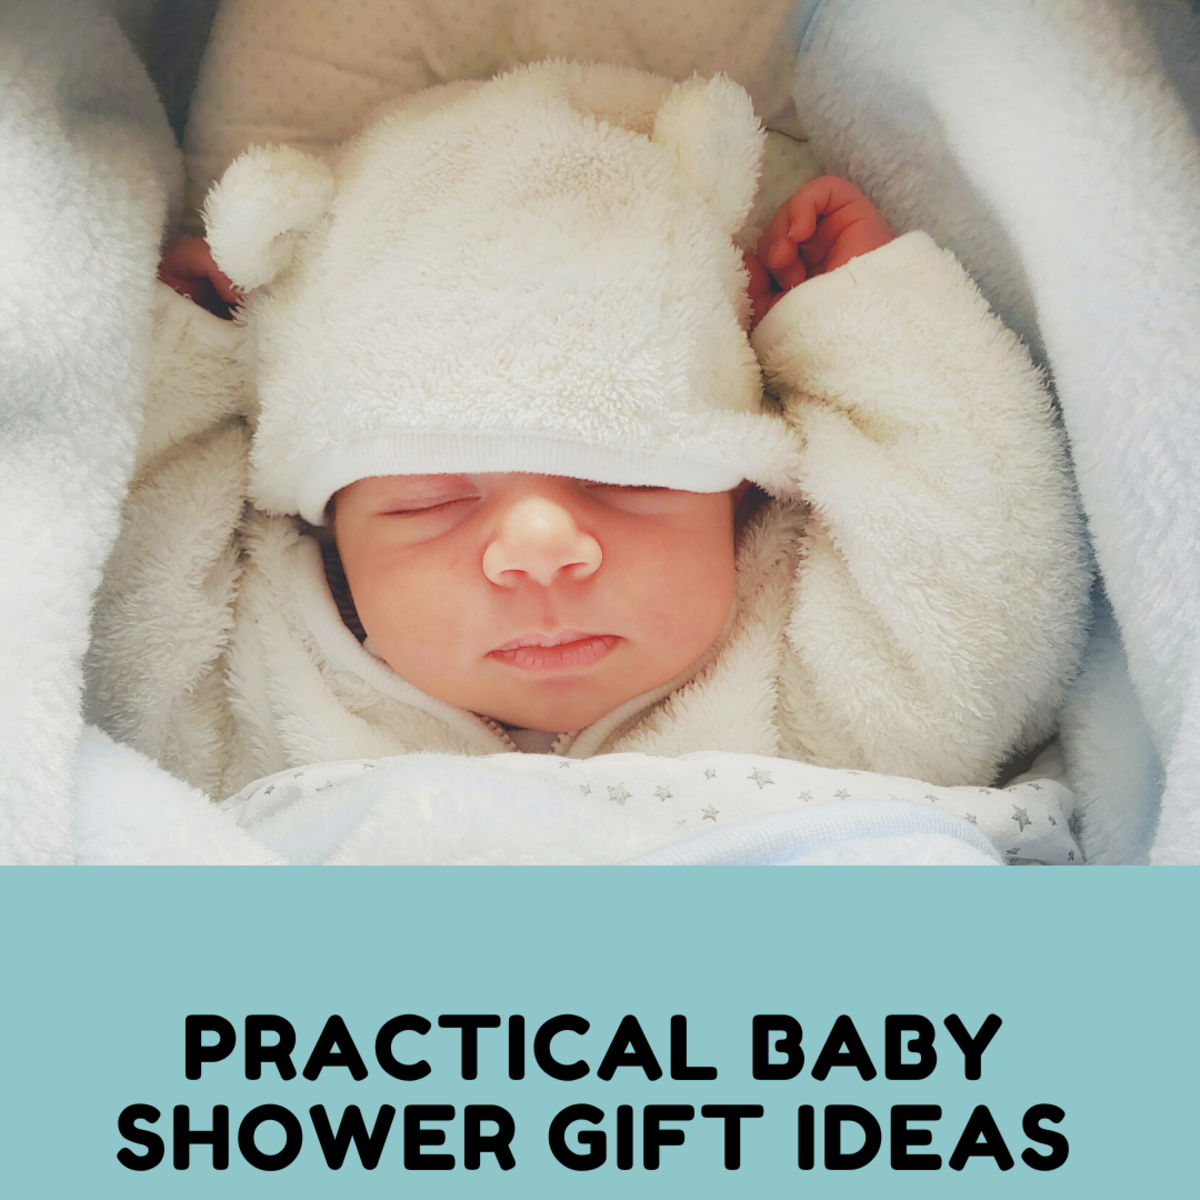 Pratical baby shower gift ideas.